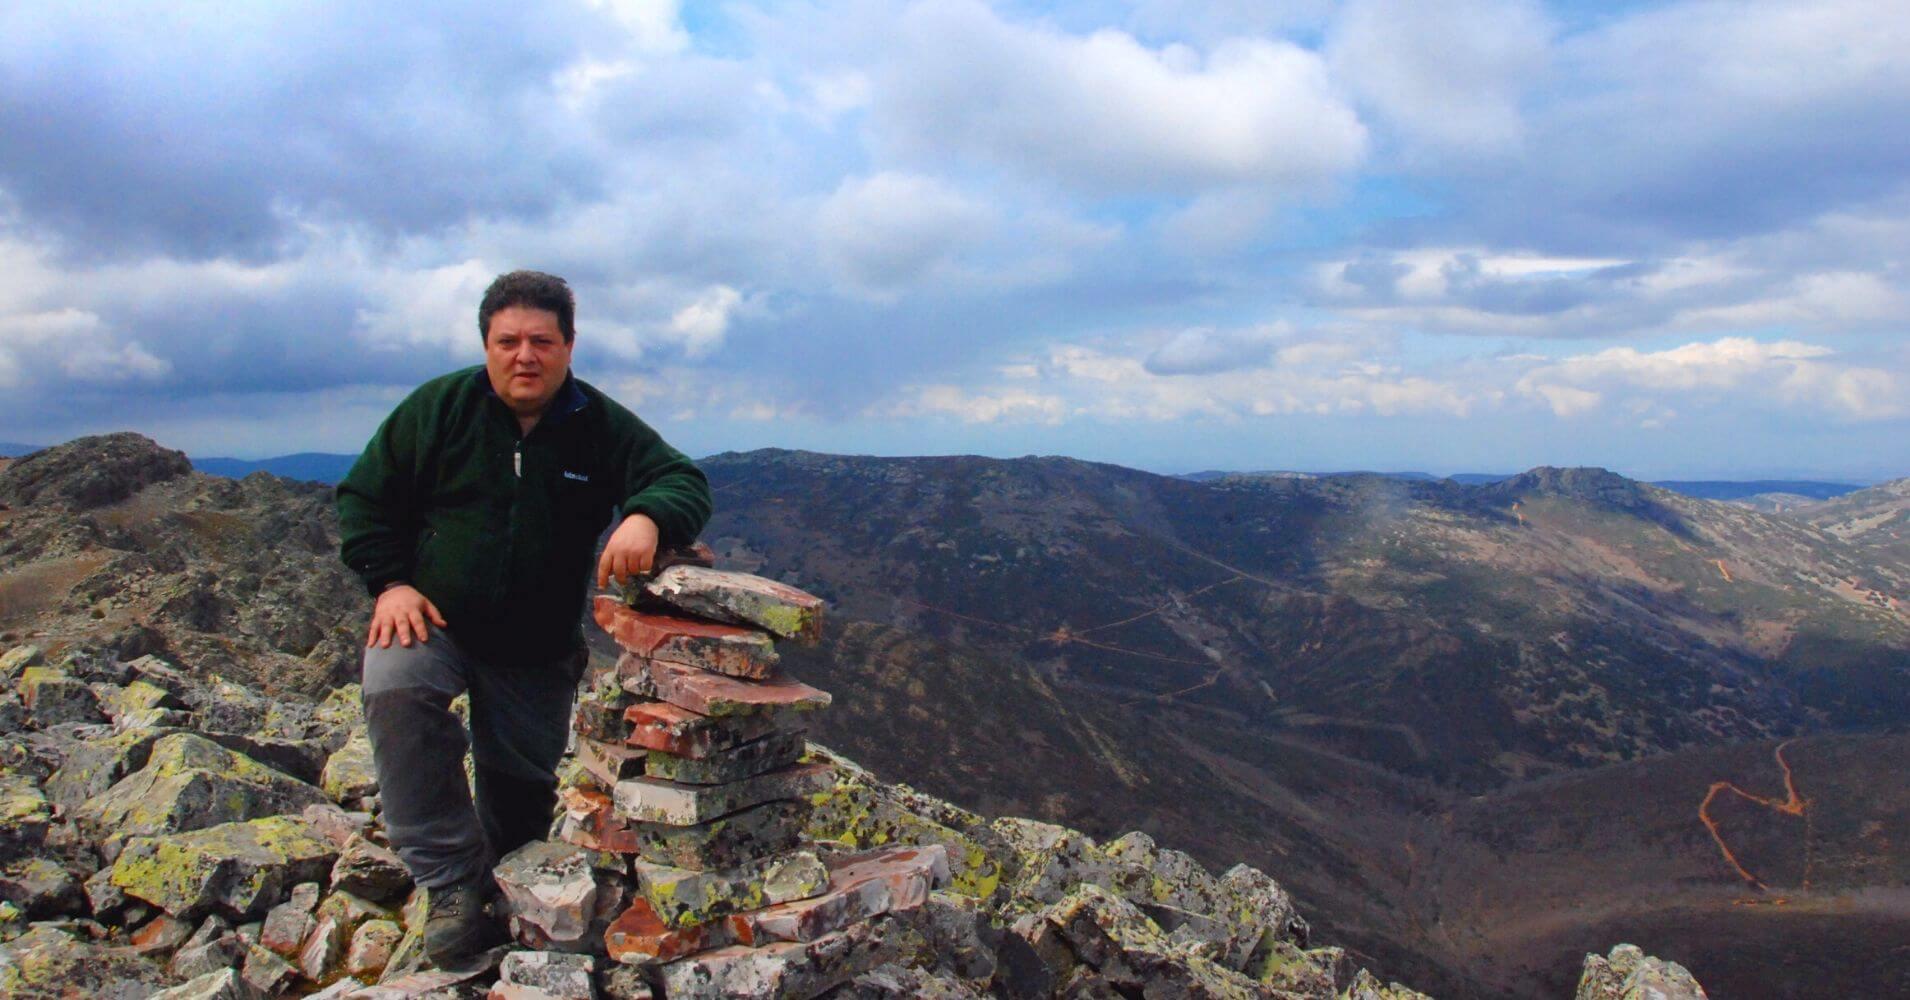 Cumbre del Pico Rocilgalgo. Toledo, Castilla la Mancha.